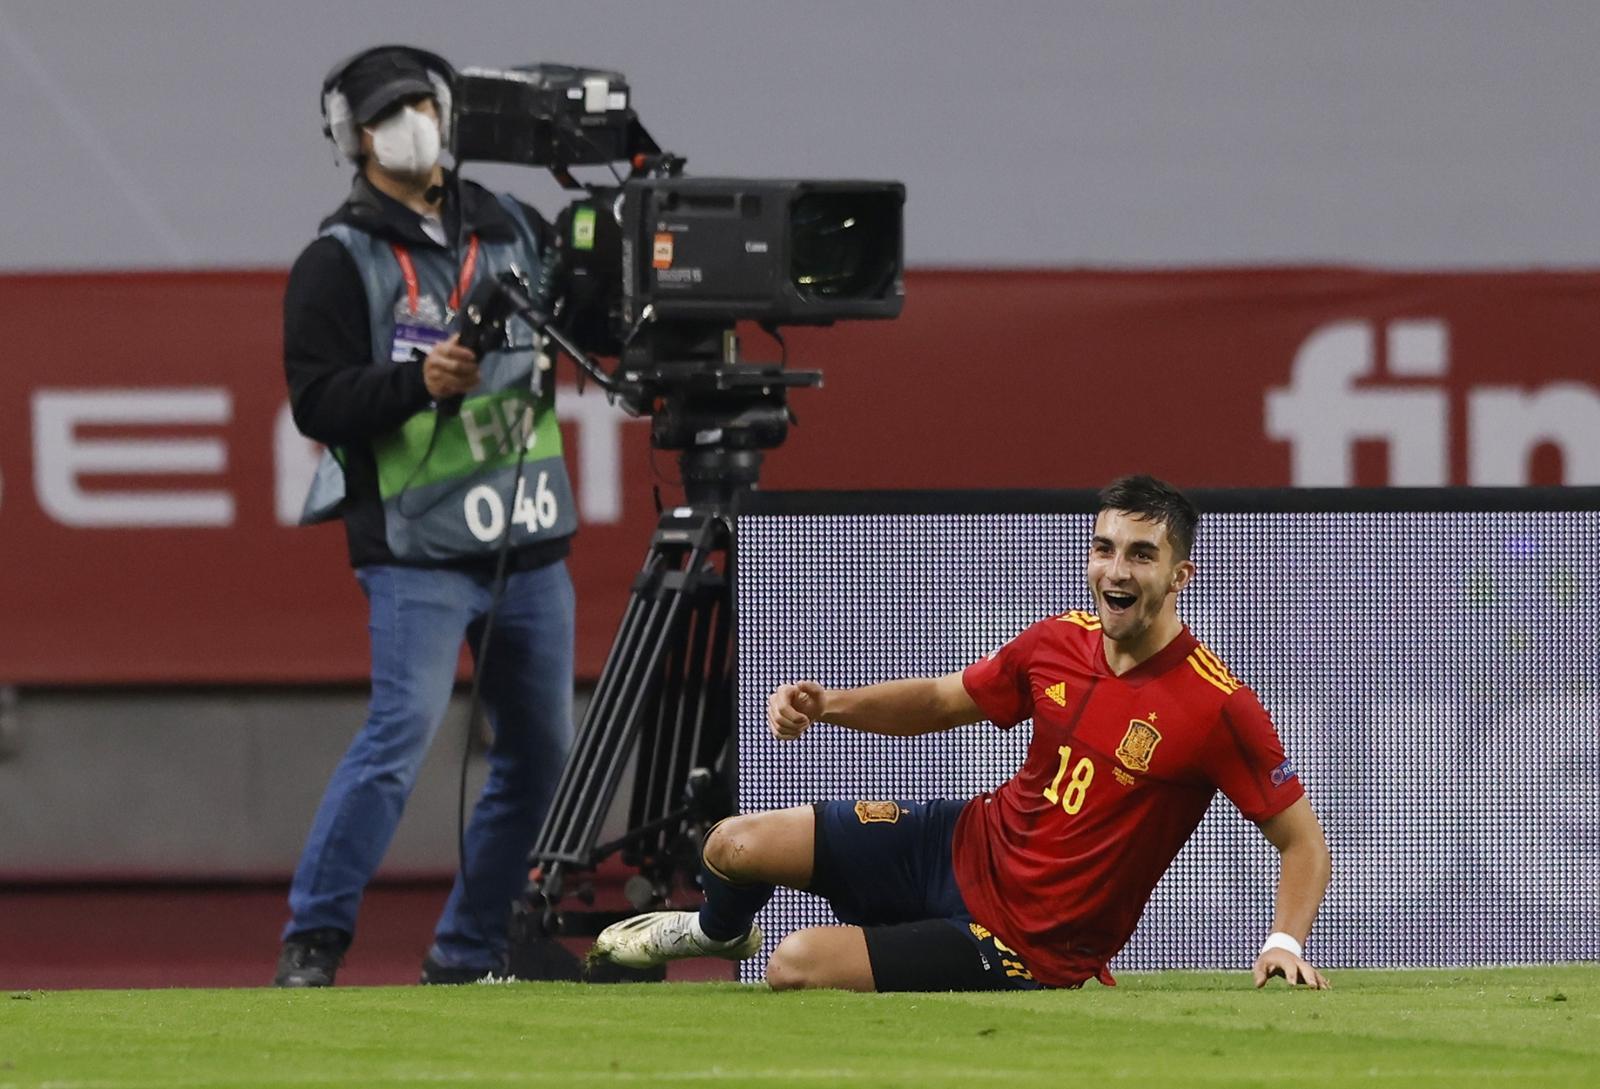 UEFA Nations League - Group D - Spain v Germany - Estadio La Cartuja, Seville, Spain - November 17, 2020 Spain's Ferran Torres celebrates scoring their fifth goal. Photo: Reuters